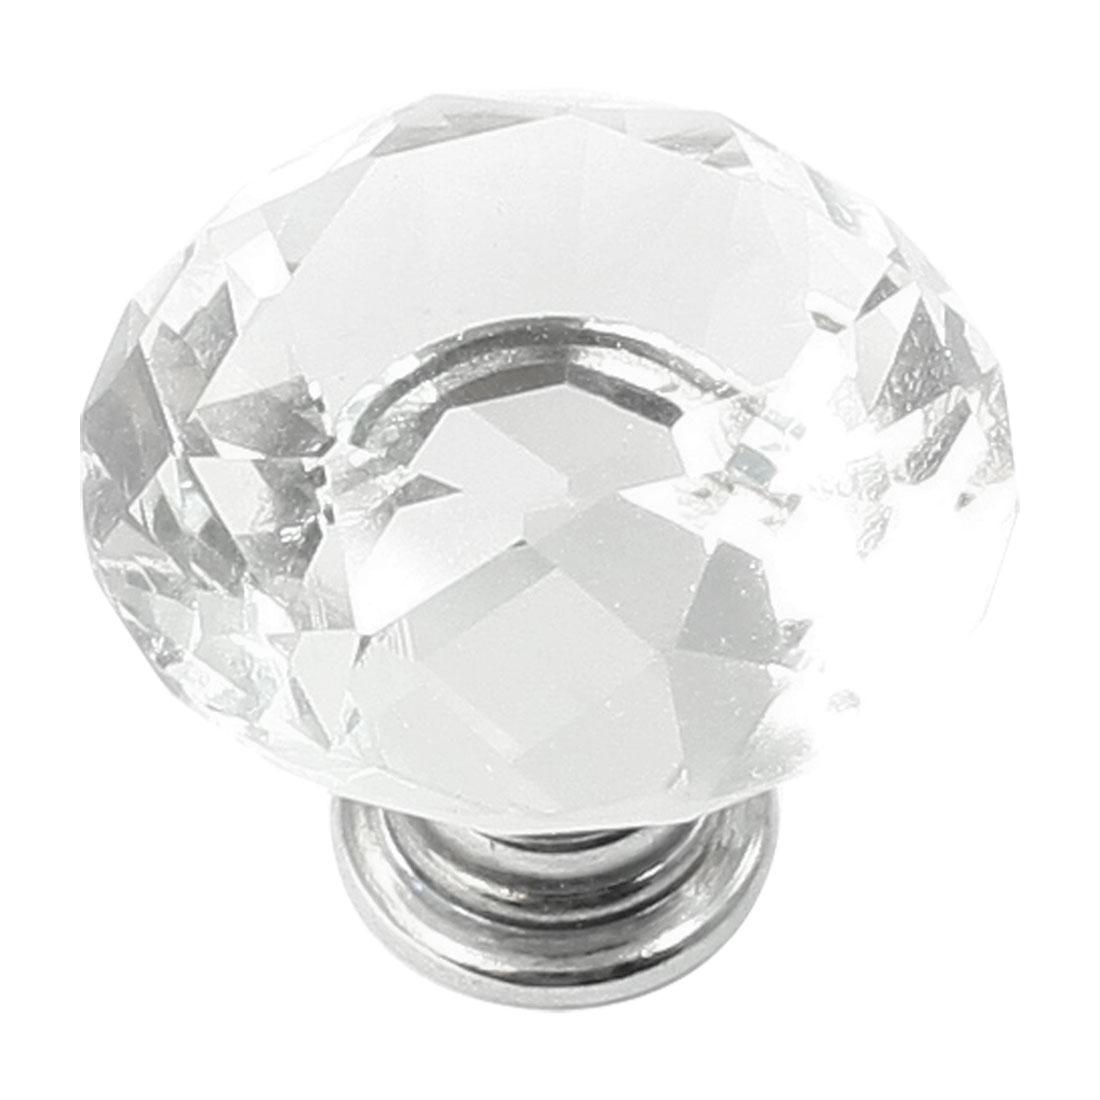 Silver Tone Base Glistening Clear Faux Crystal Knob Drawer Handle